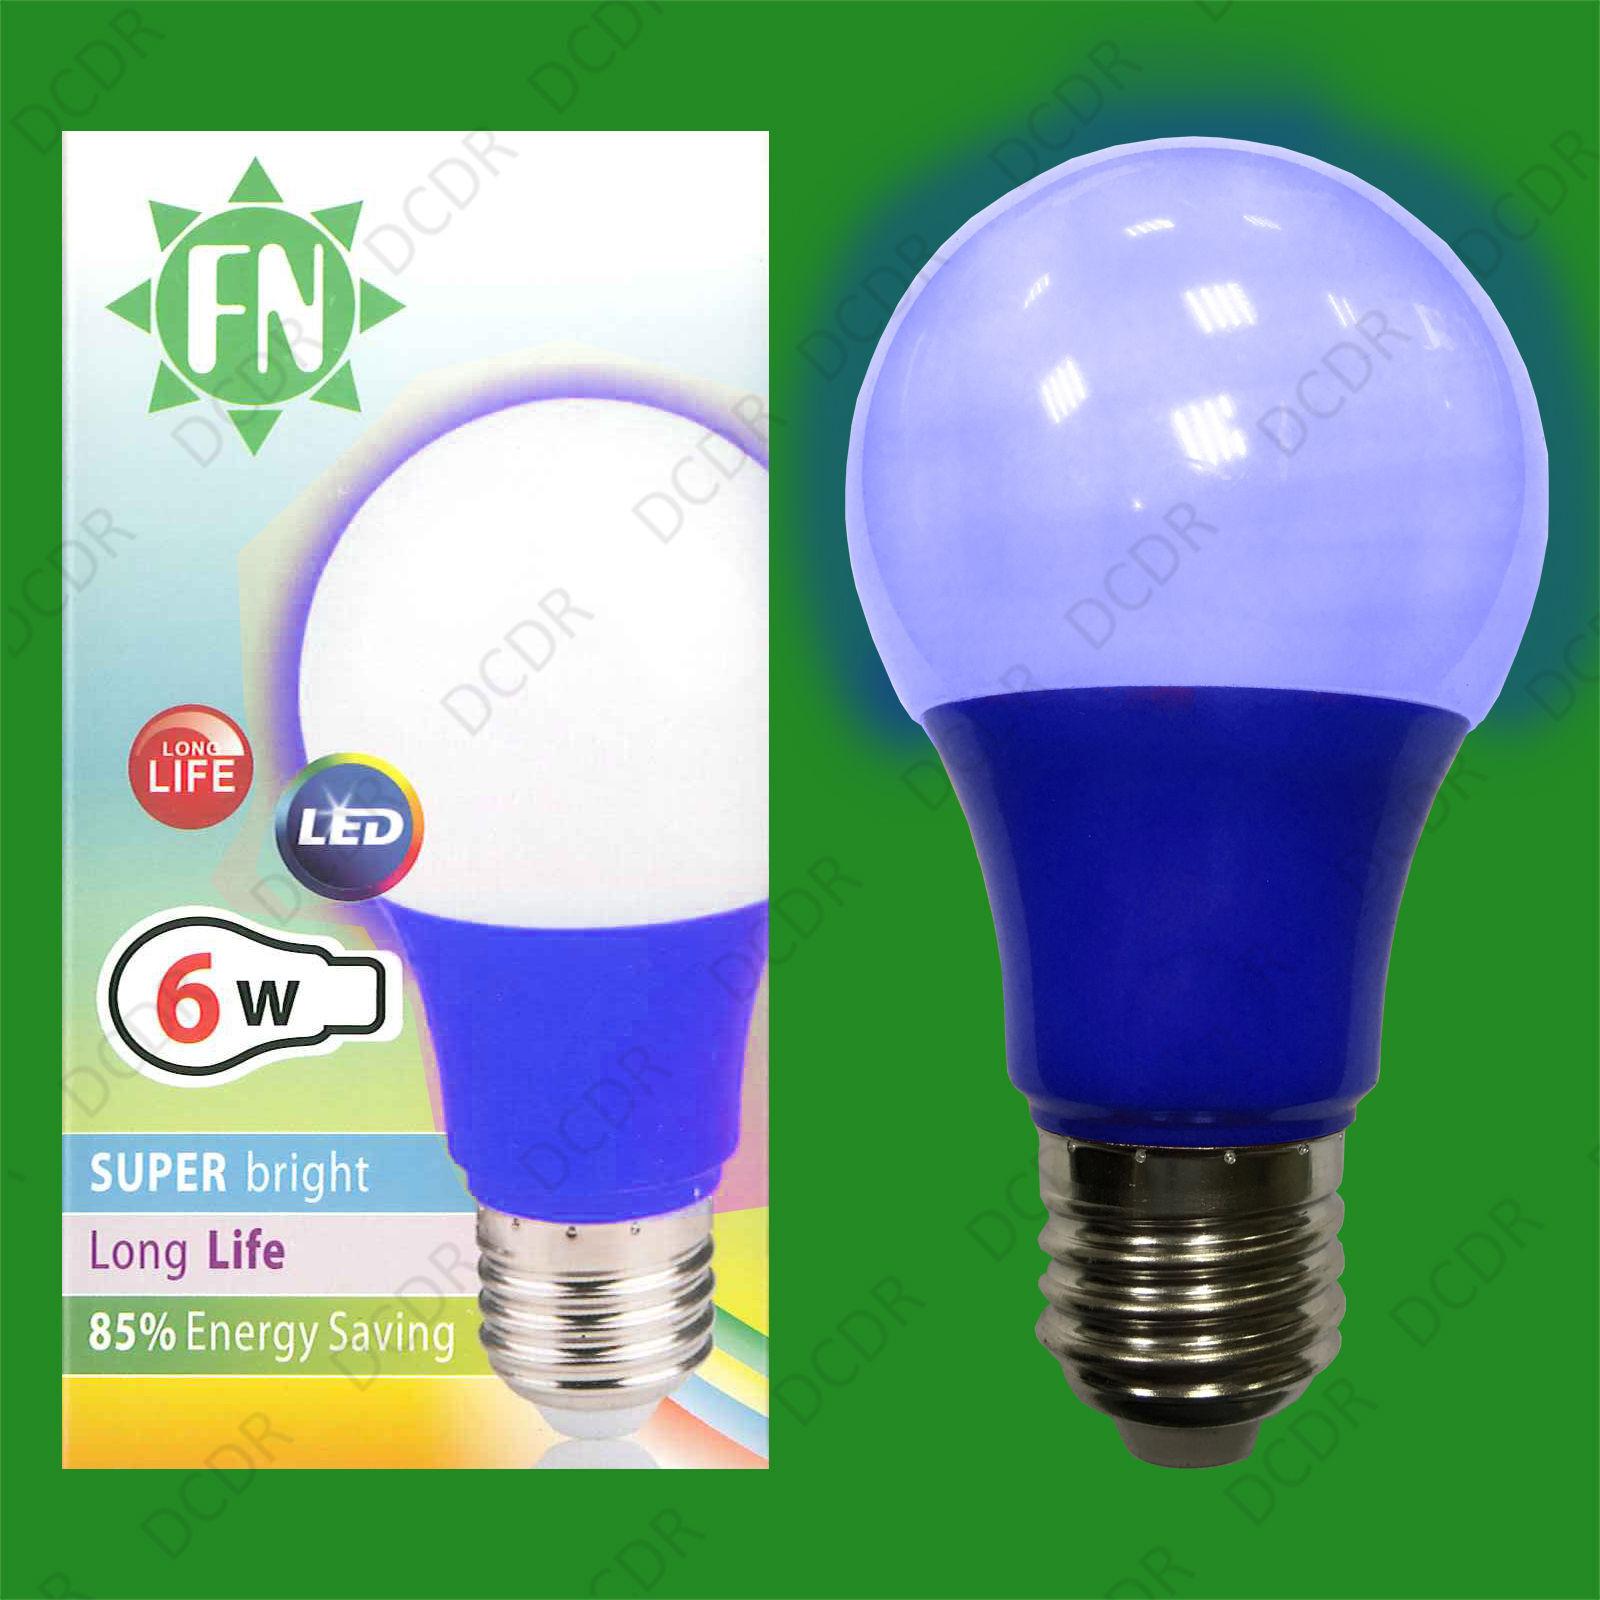 10x 6W LED Blau Colourot GLS A60 Light Bulb Lamp ES E27, Low Energy 110 - 265V